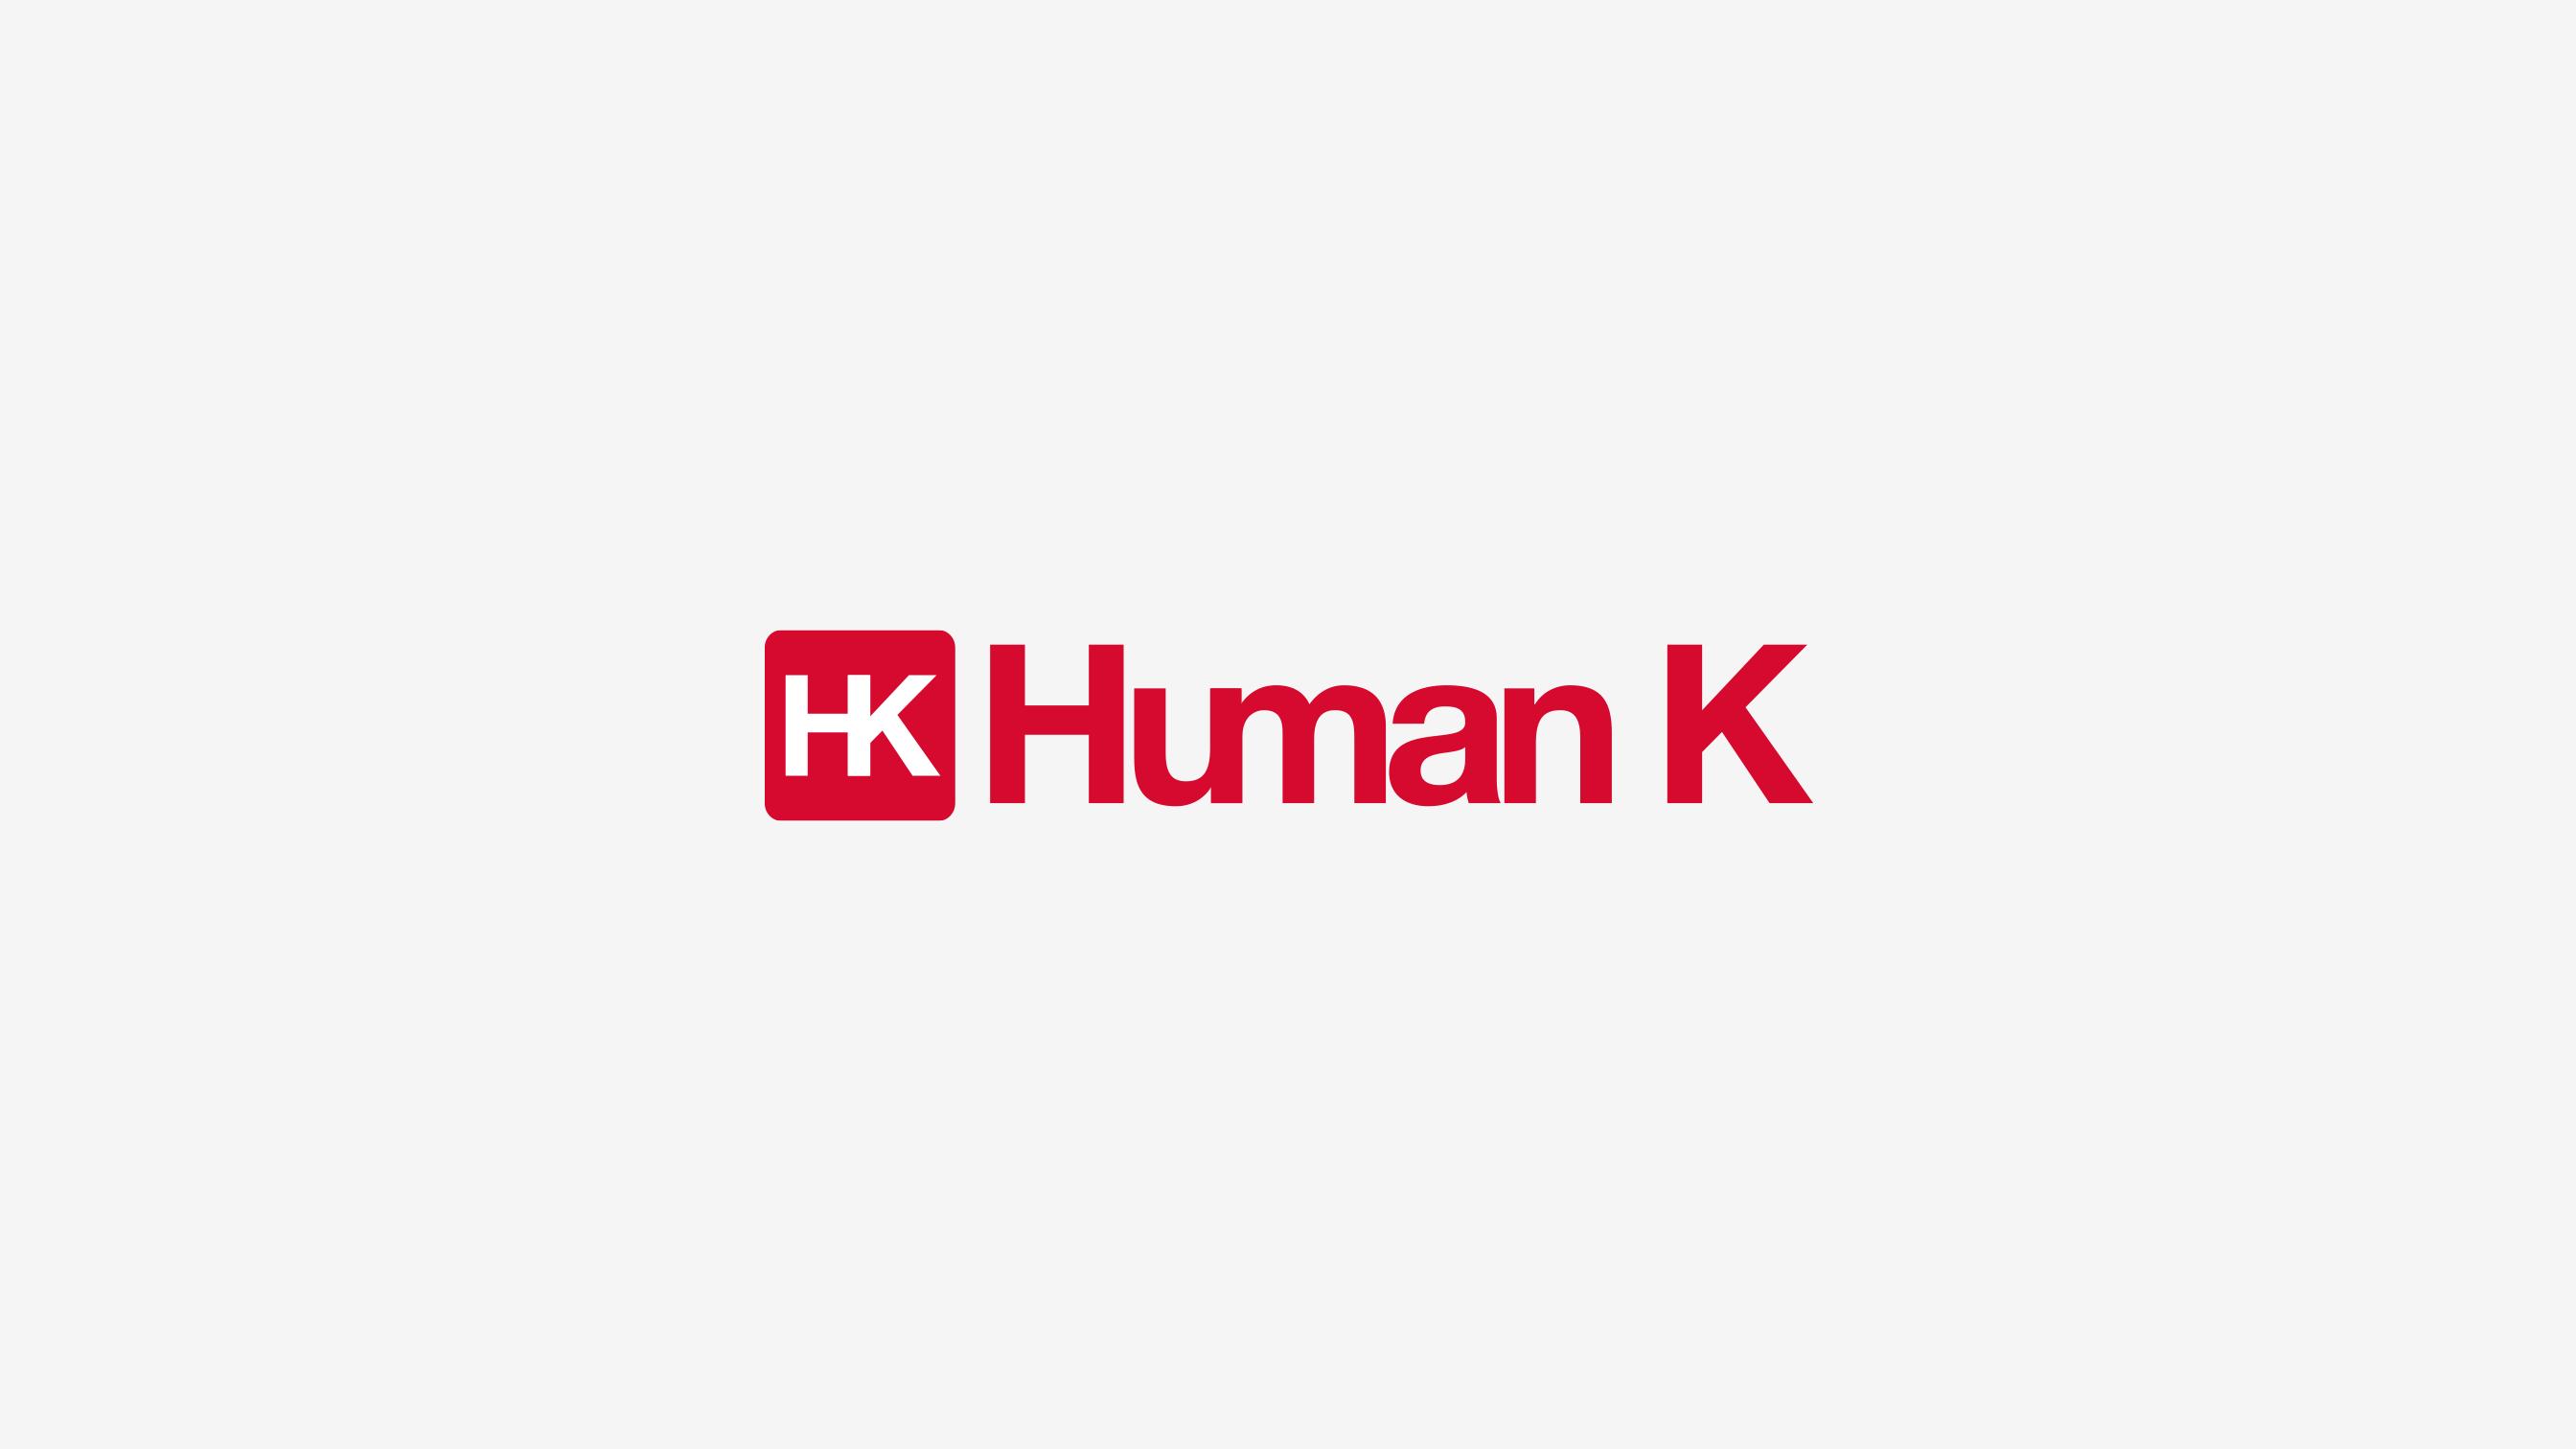 humank-logotype-pikteo